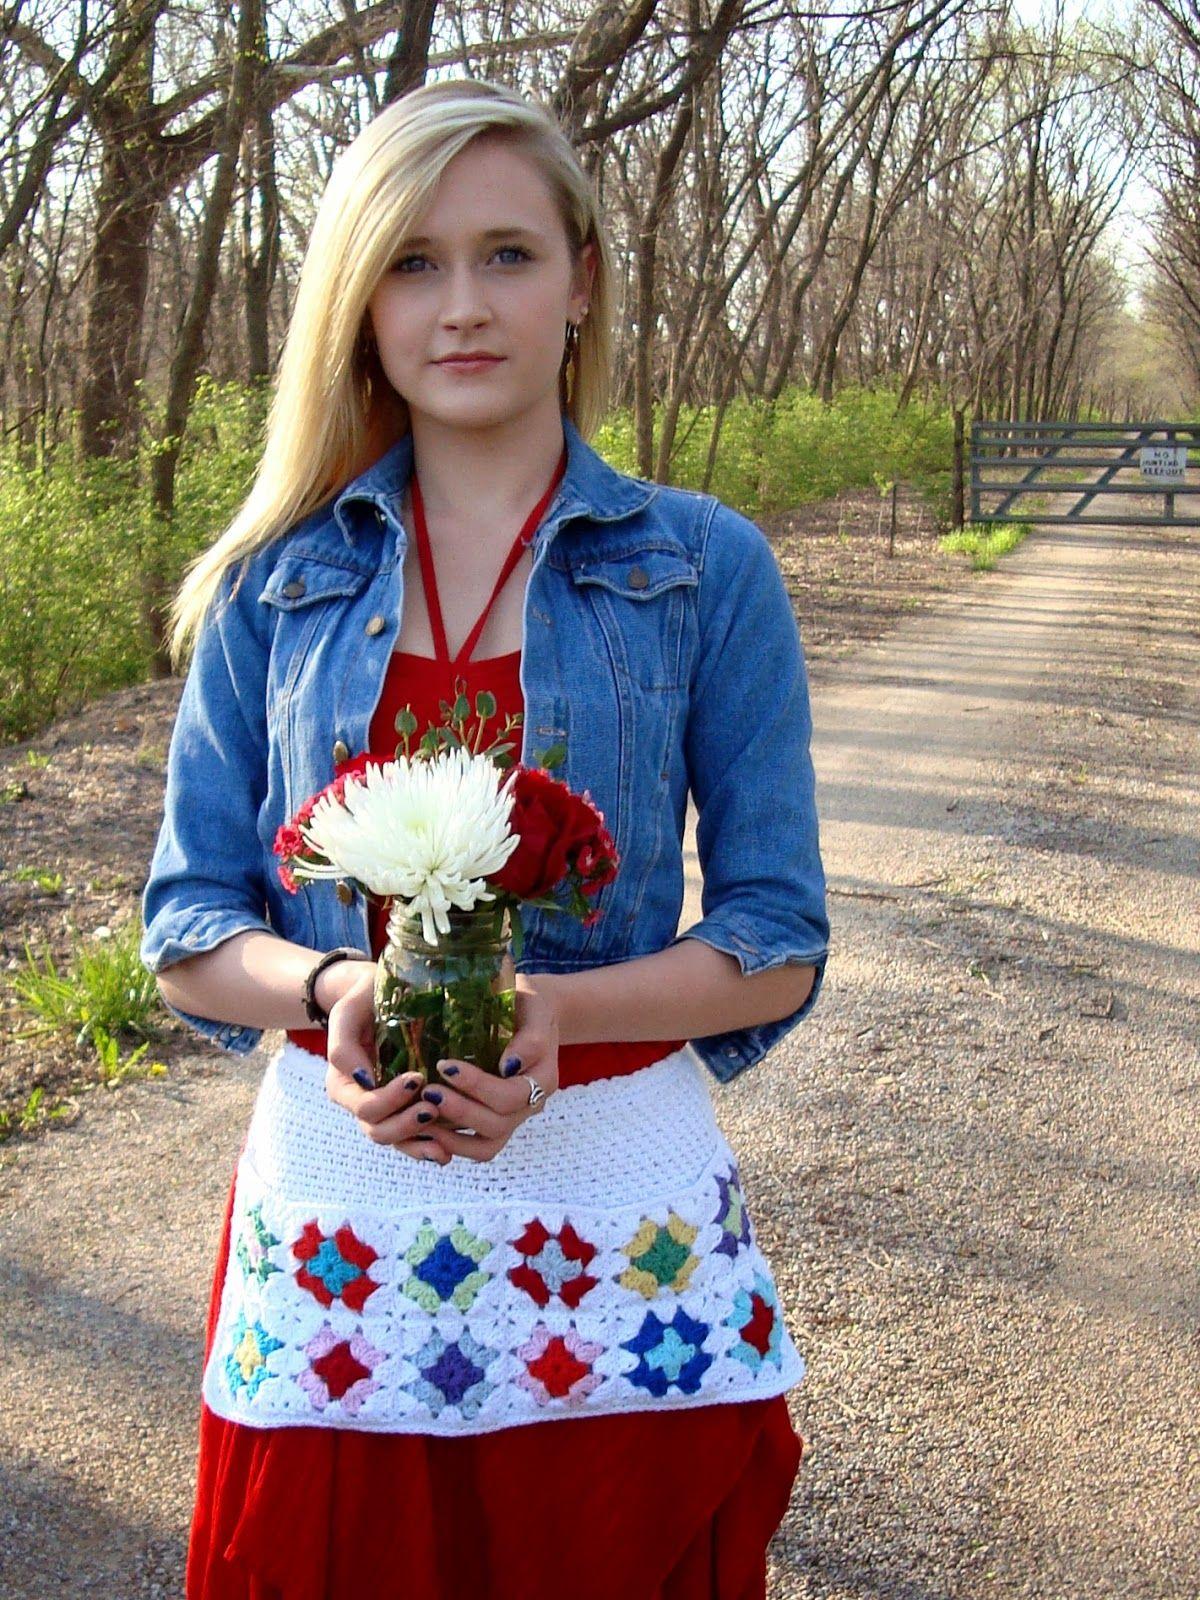 free crochet pattern grannys market apron | CROCHET FUN | Pinterest ...